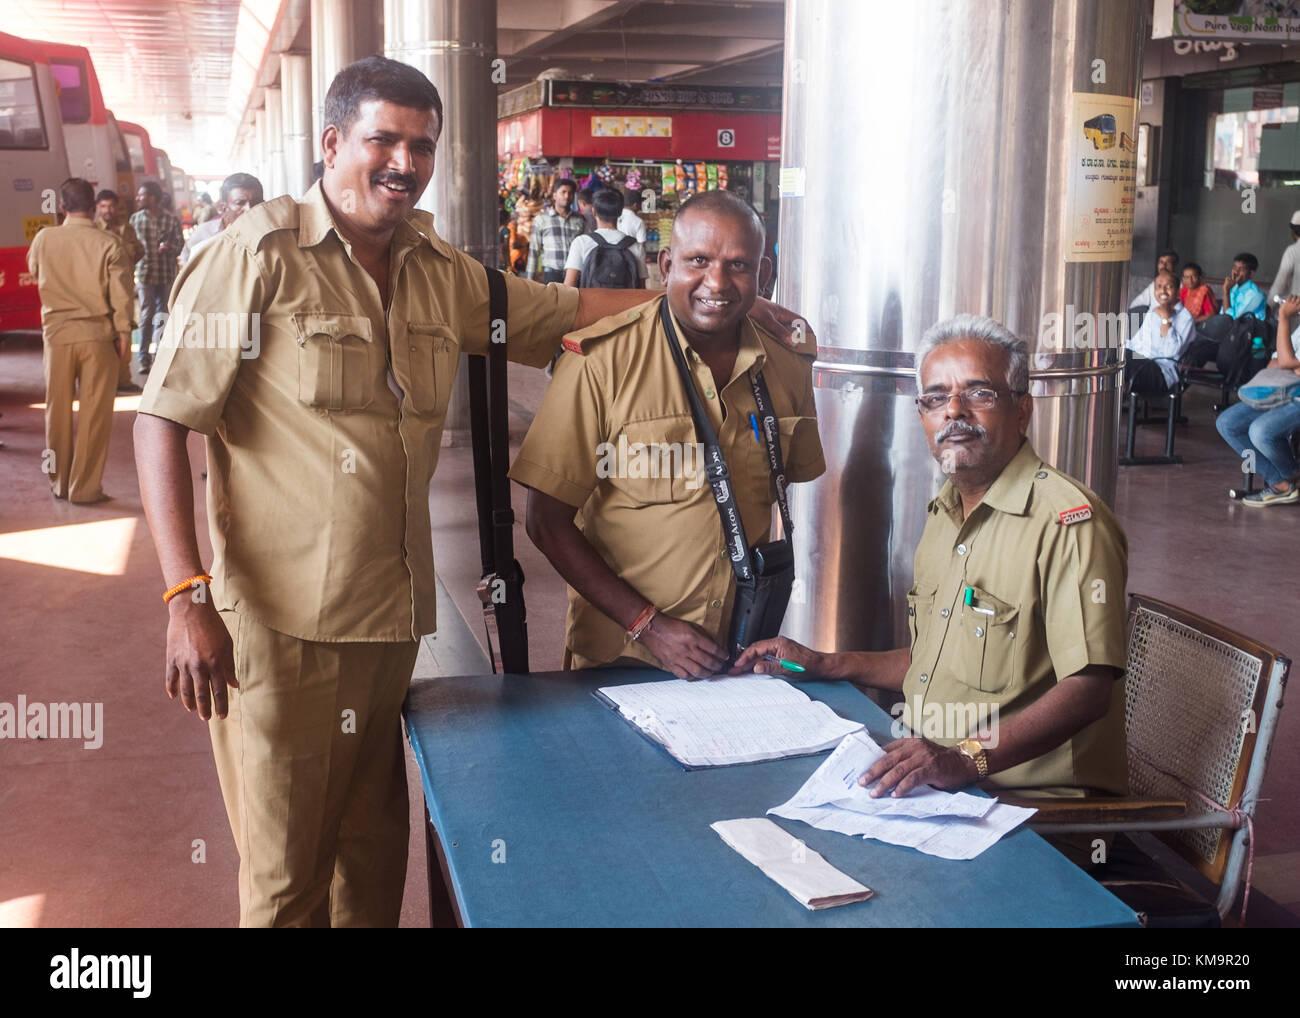 Karnataka Bus Stock Photos & Karnataka Bus Stock Images - Alamy